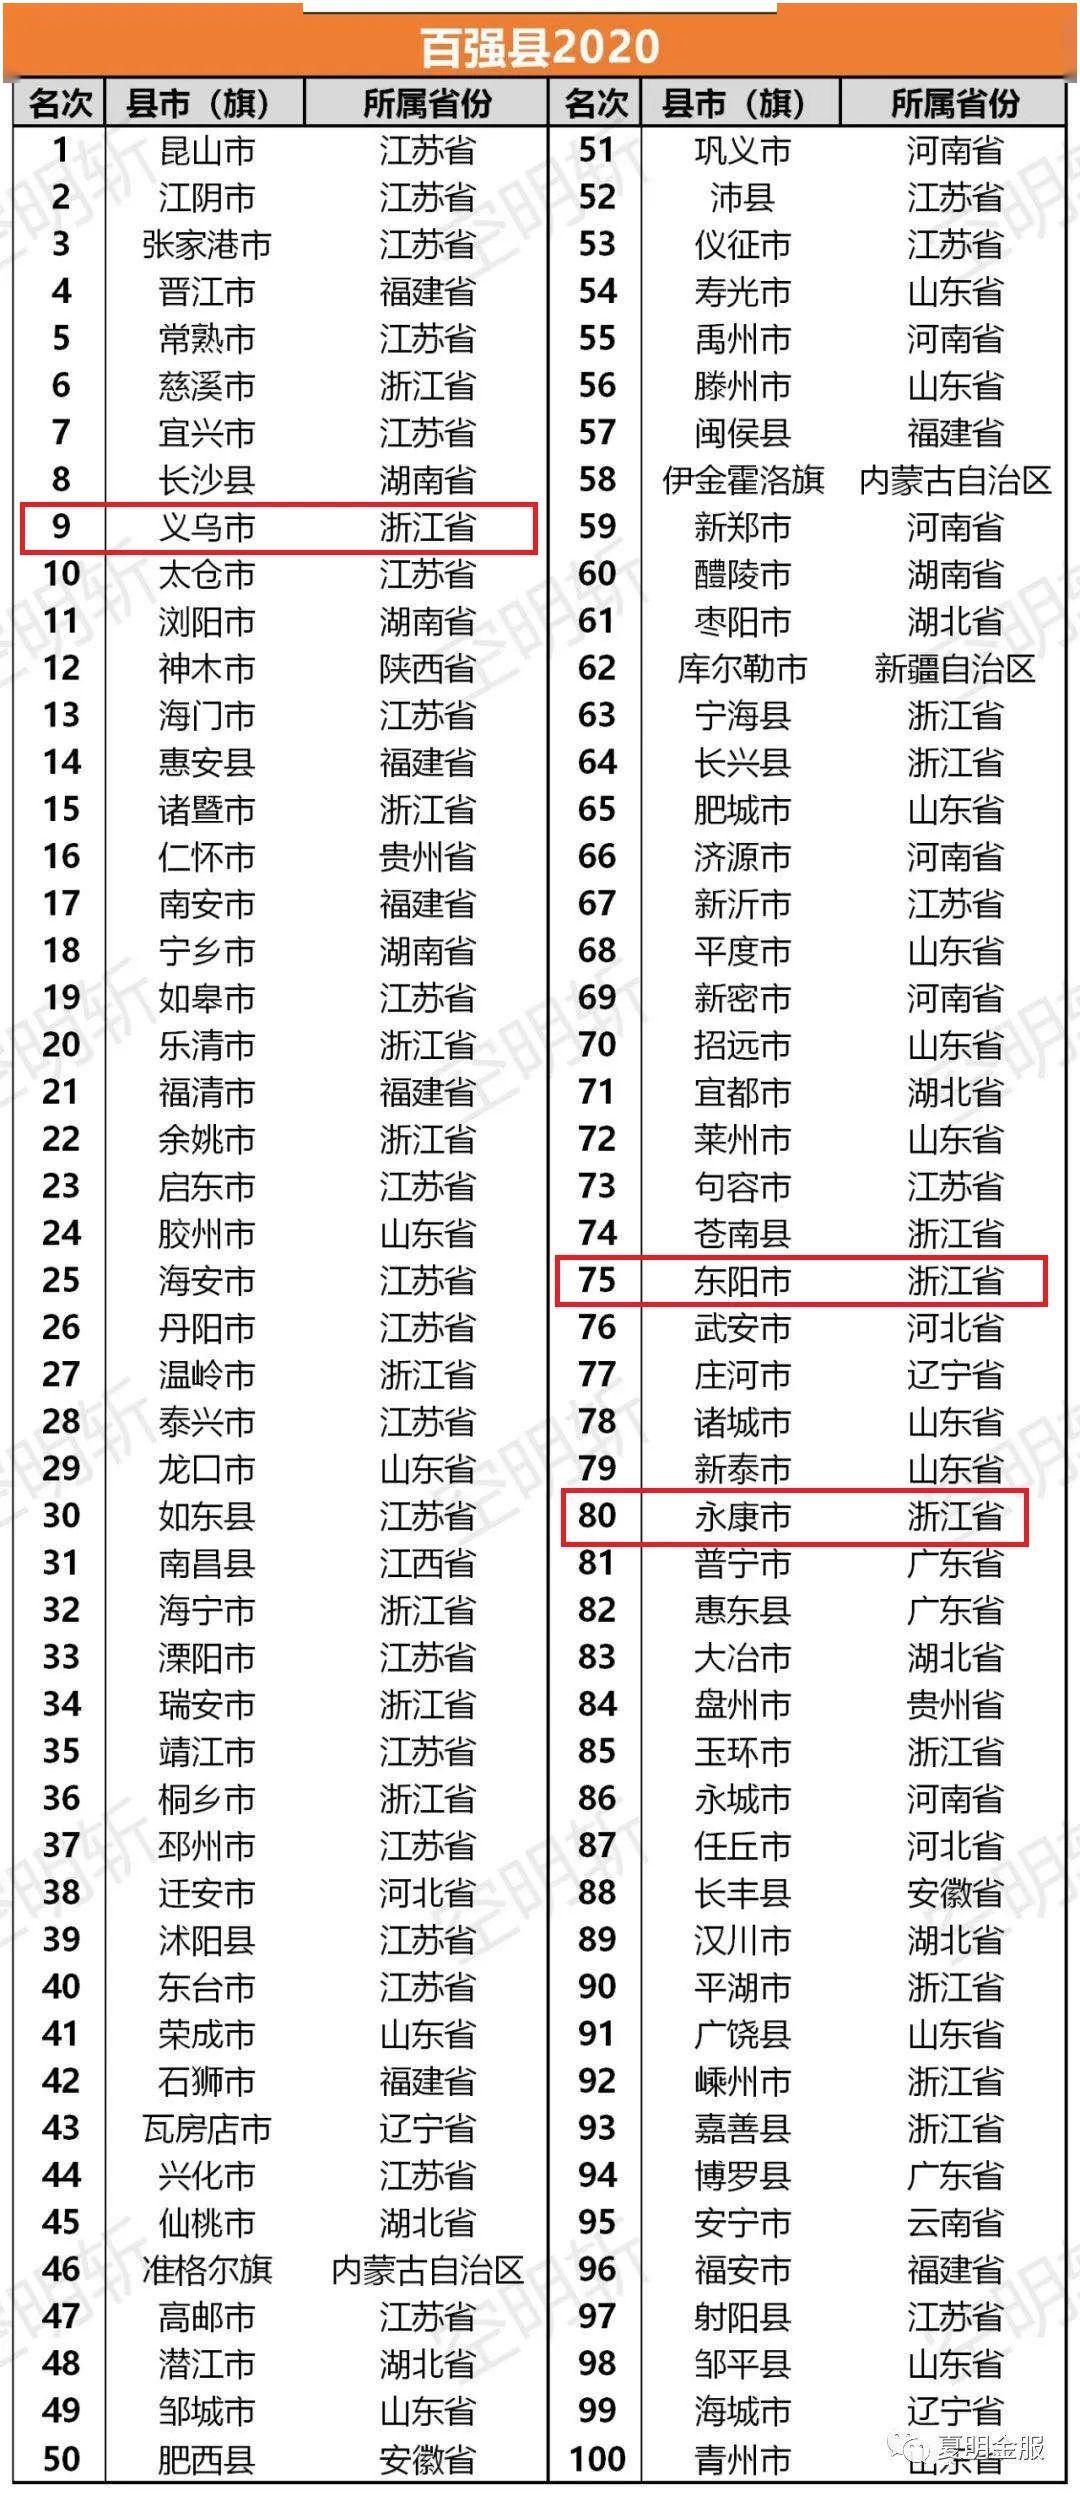 gdp排行榜_2019全国gdp排行榜